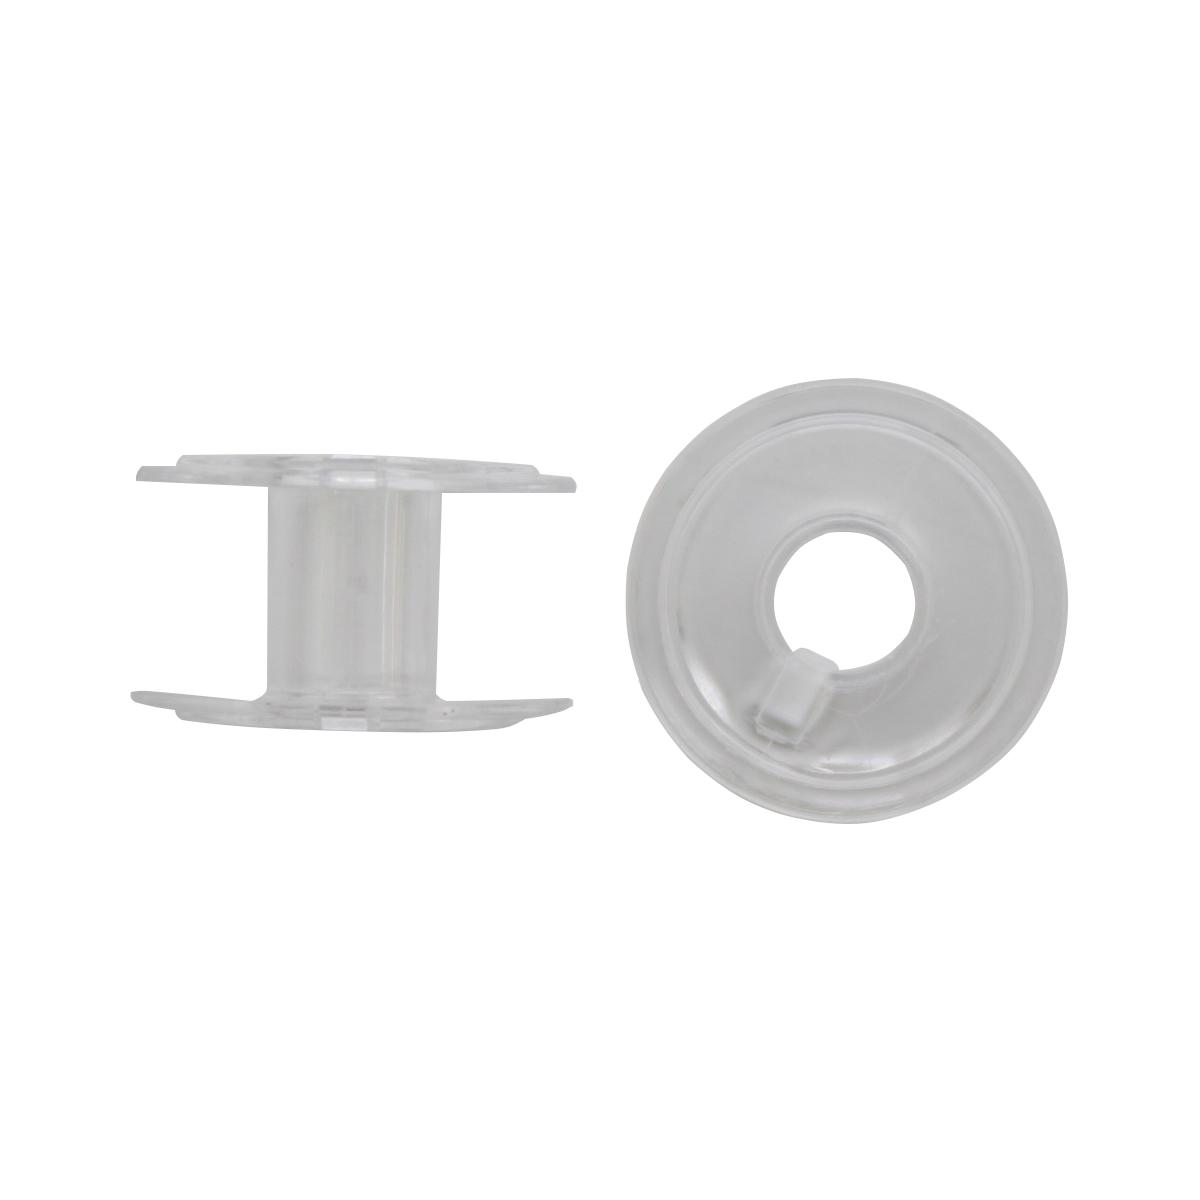 Bestex Шпулька пластиковая ТВ-В01, 0350-0000, прозрачная, 10 шт163012